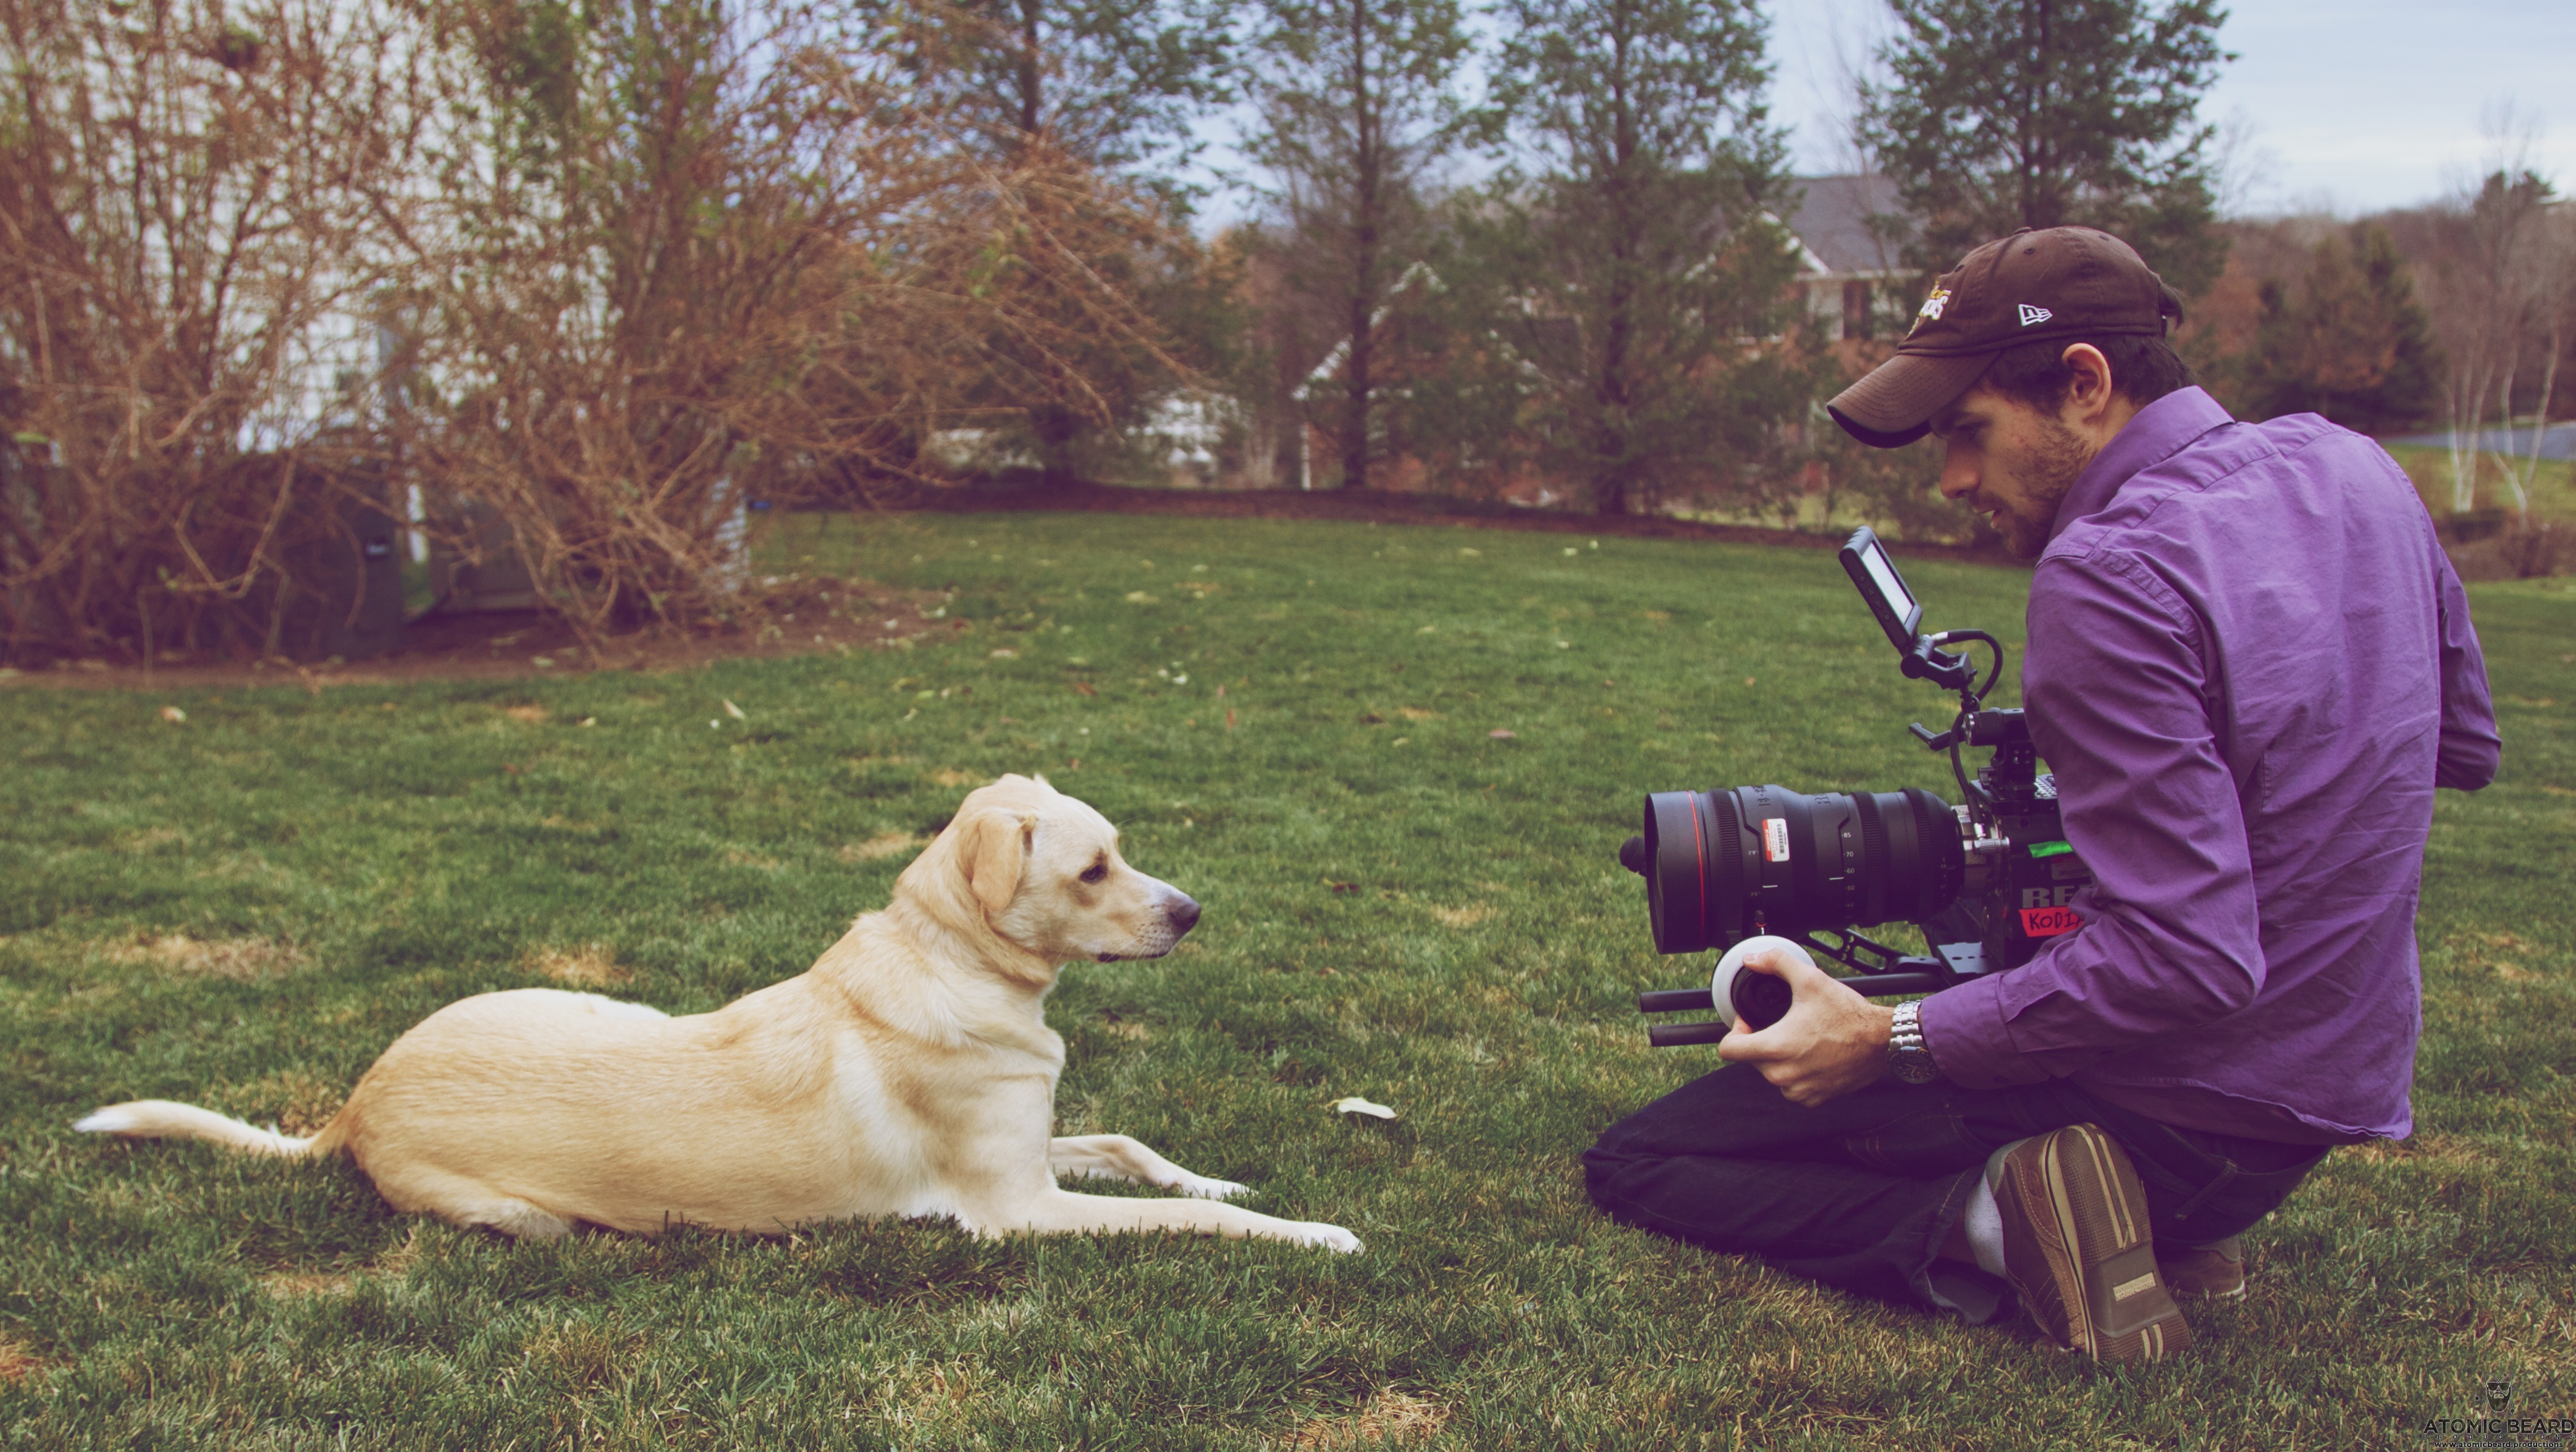 Potcake: A Dogumentary Set